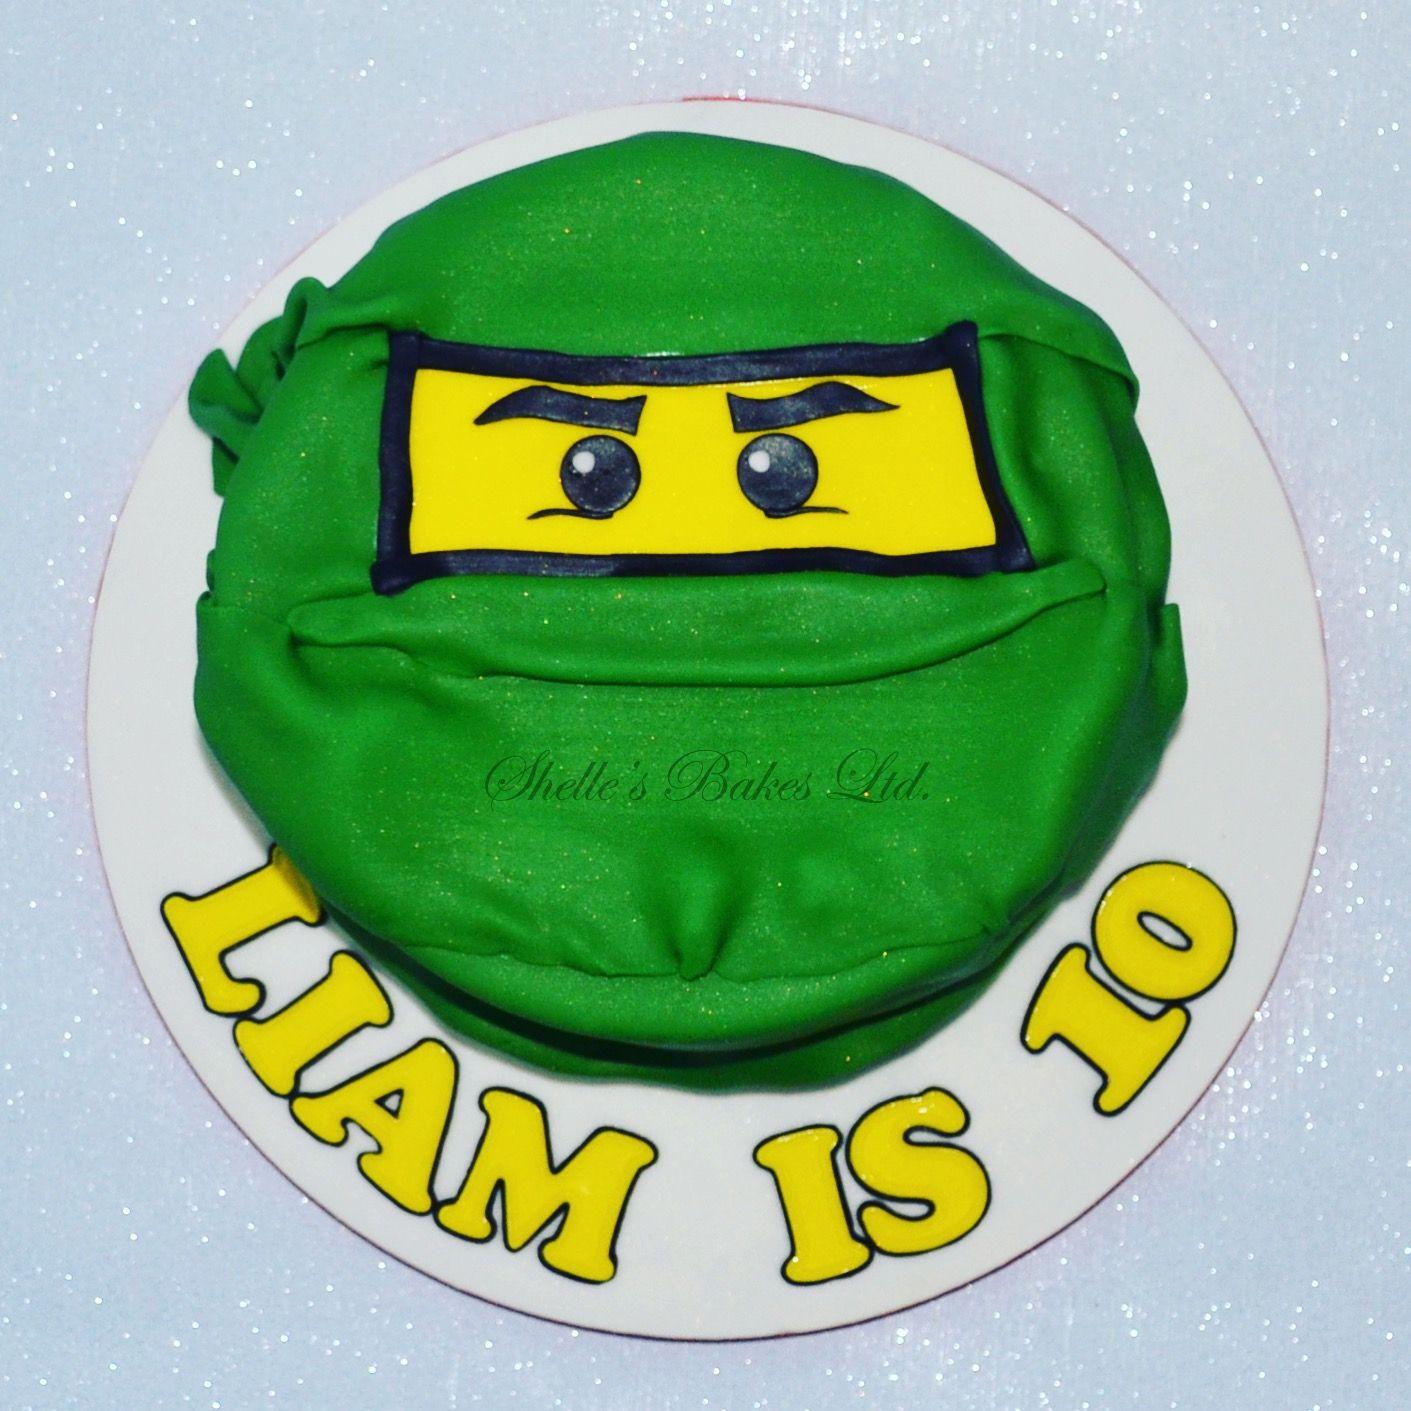 Lego Ninjago Green Ninja Face Cake Cake Cake Toppers